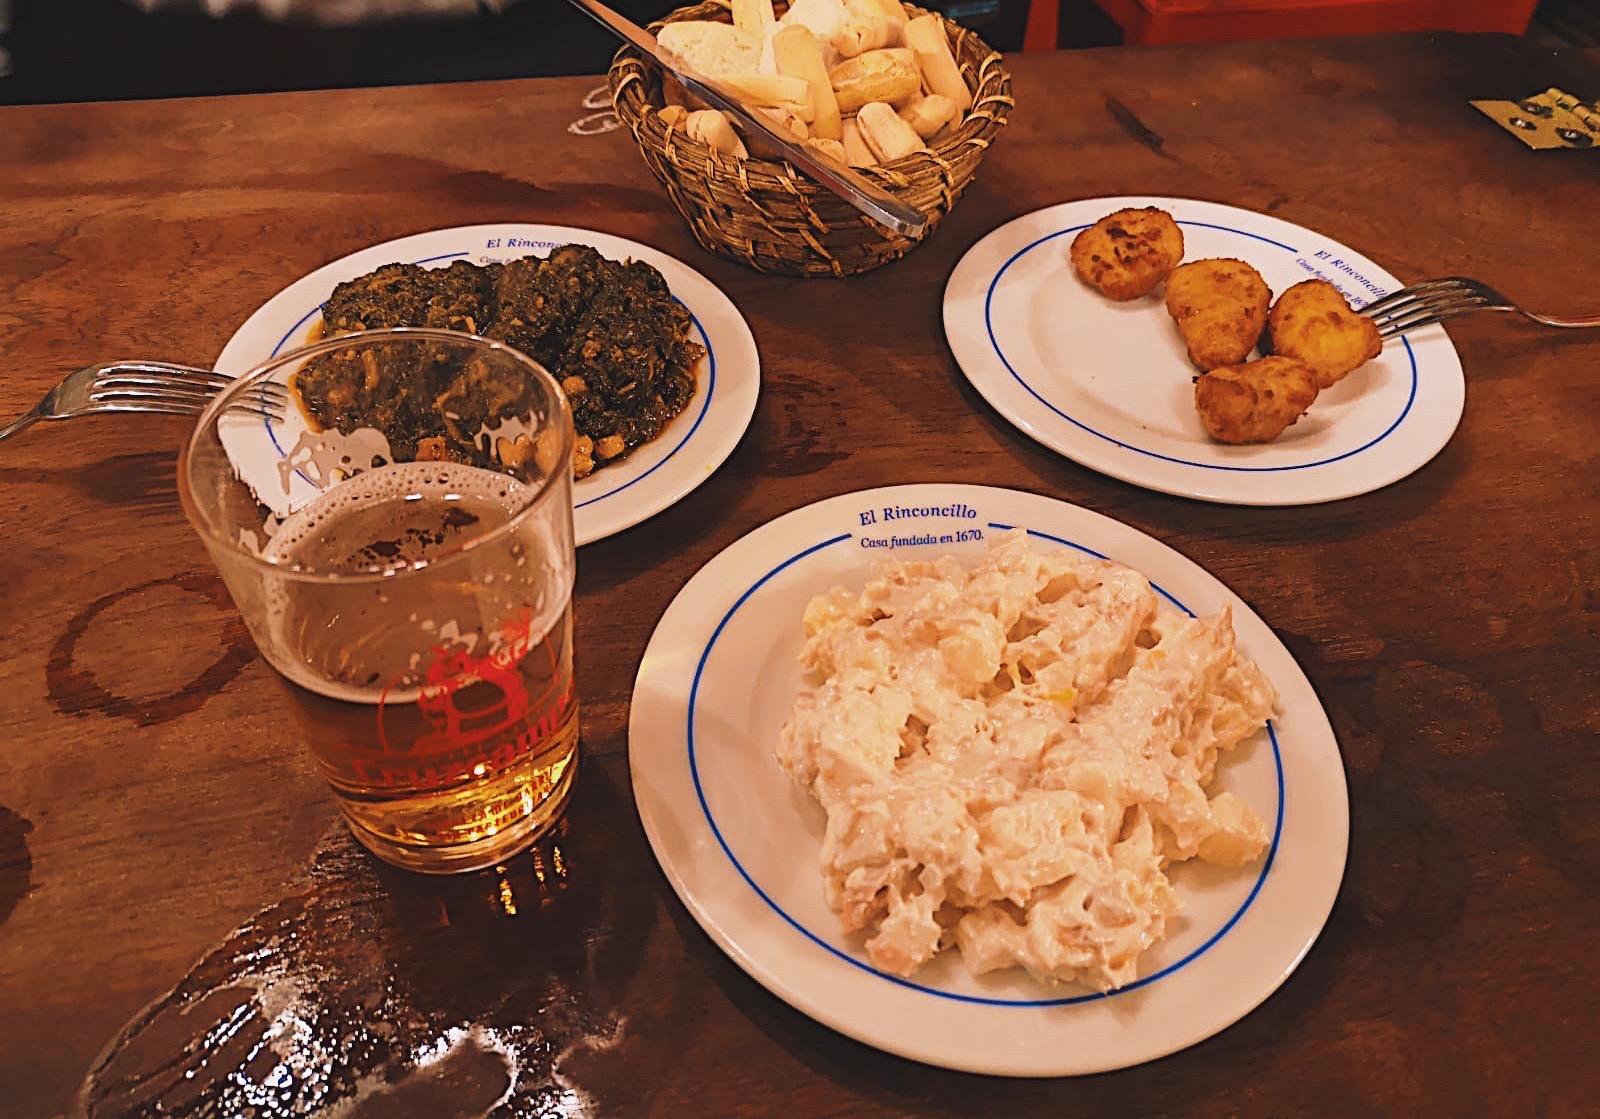 redhead-round-the-world-blogger-food-foodie-foodblog-spain-el-rinconcillo-inside-beer-food.JPG